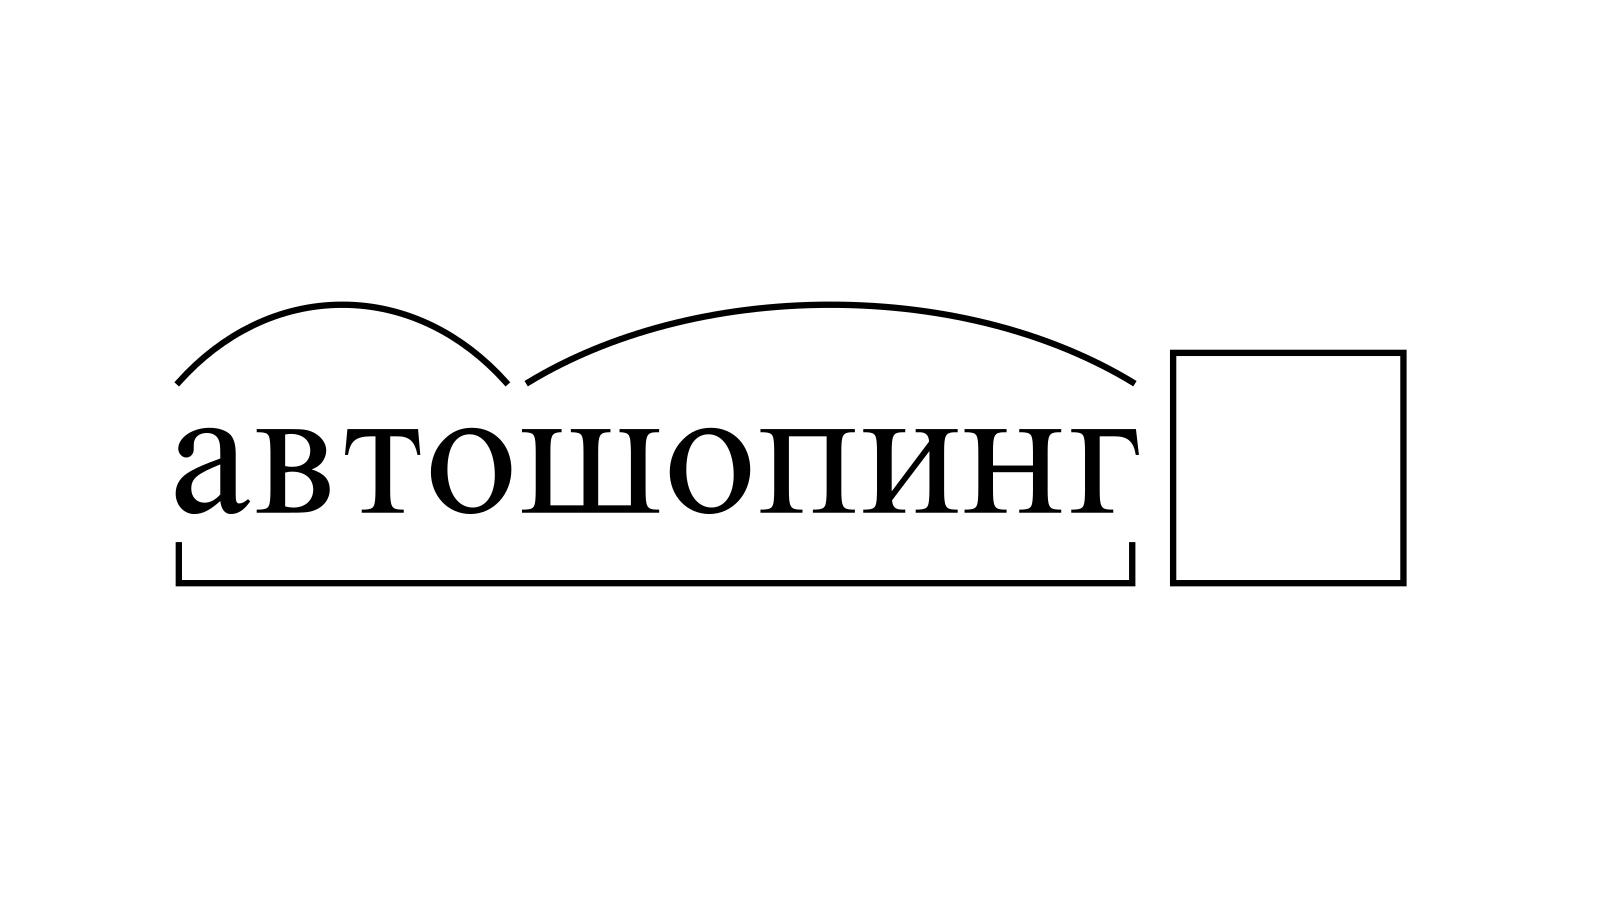 Разбор слова «автошопинг» по составу